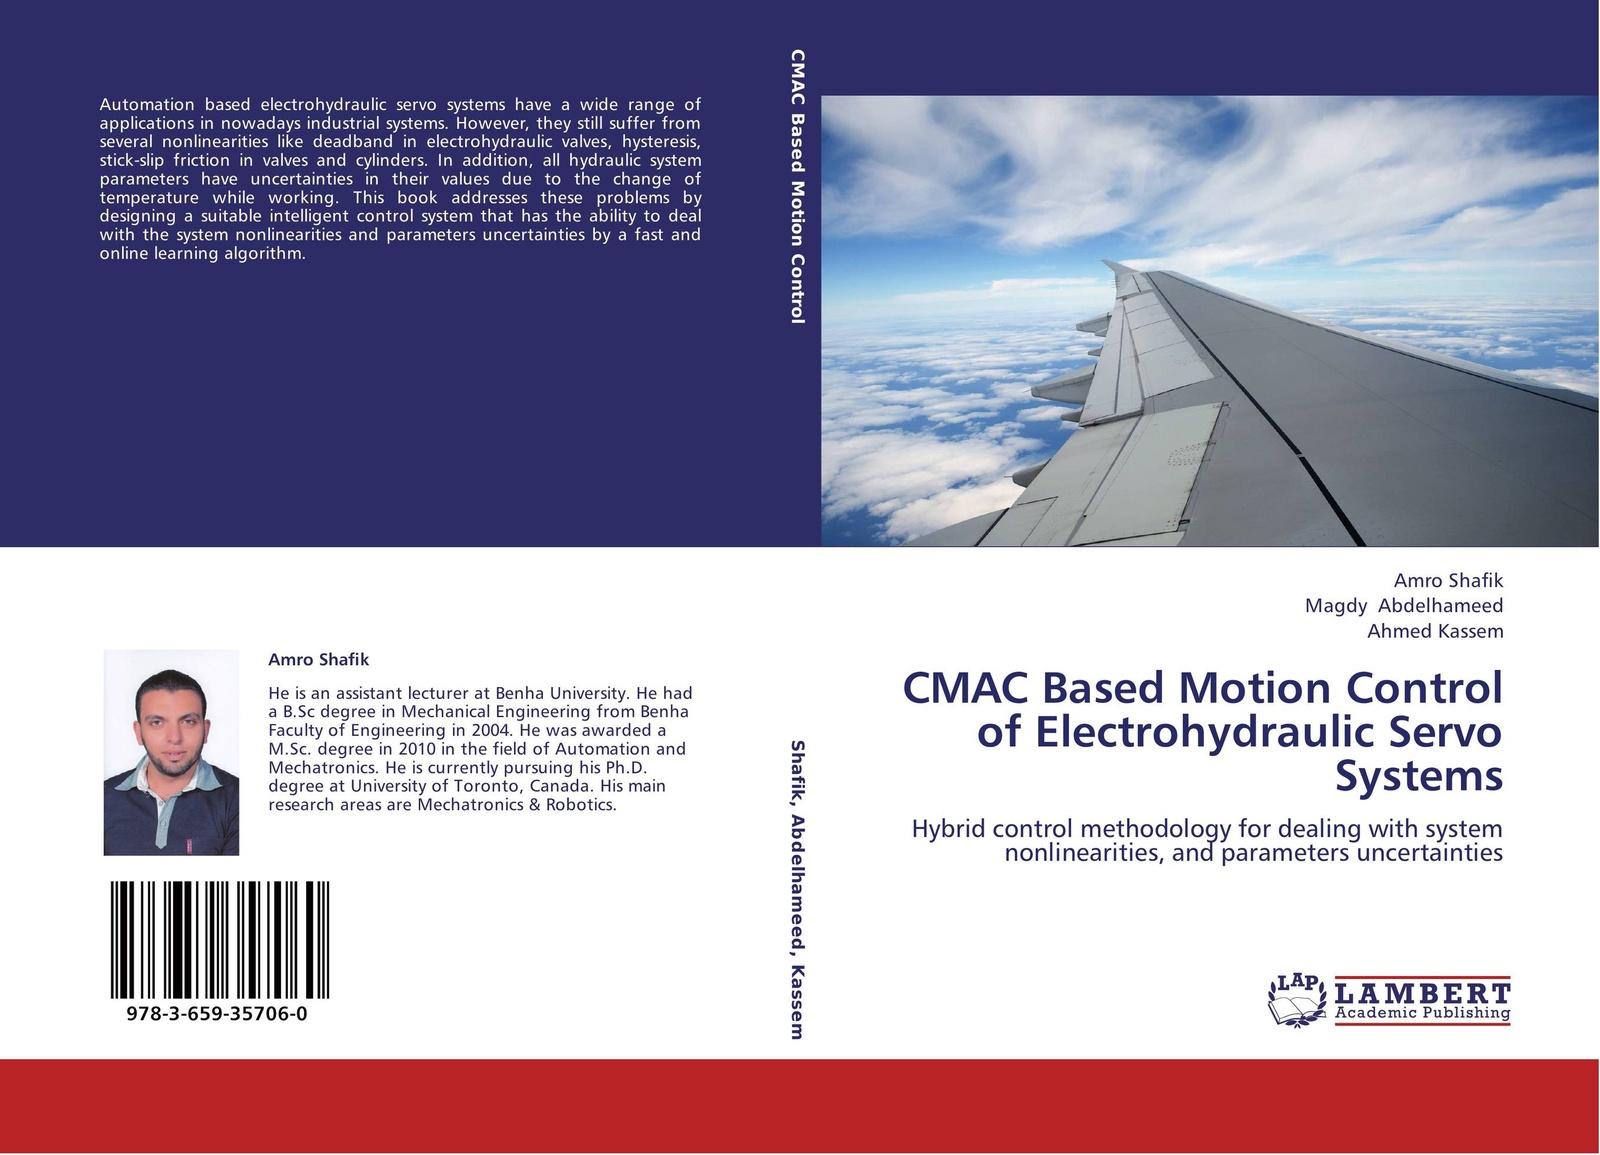 Amro Shafik,Magdy Abdelhameed and Ahmed Kassem CMAC Based Motion Control of Electrohydraulic Servo Systems